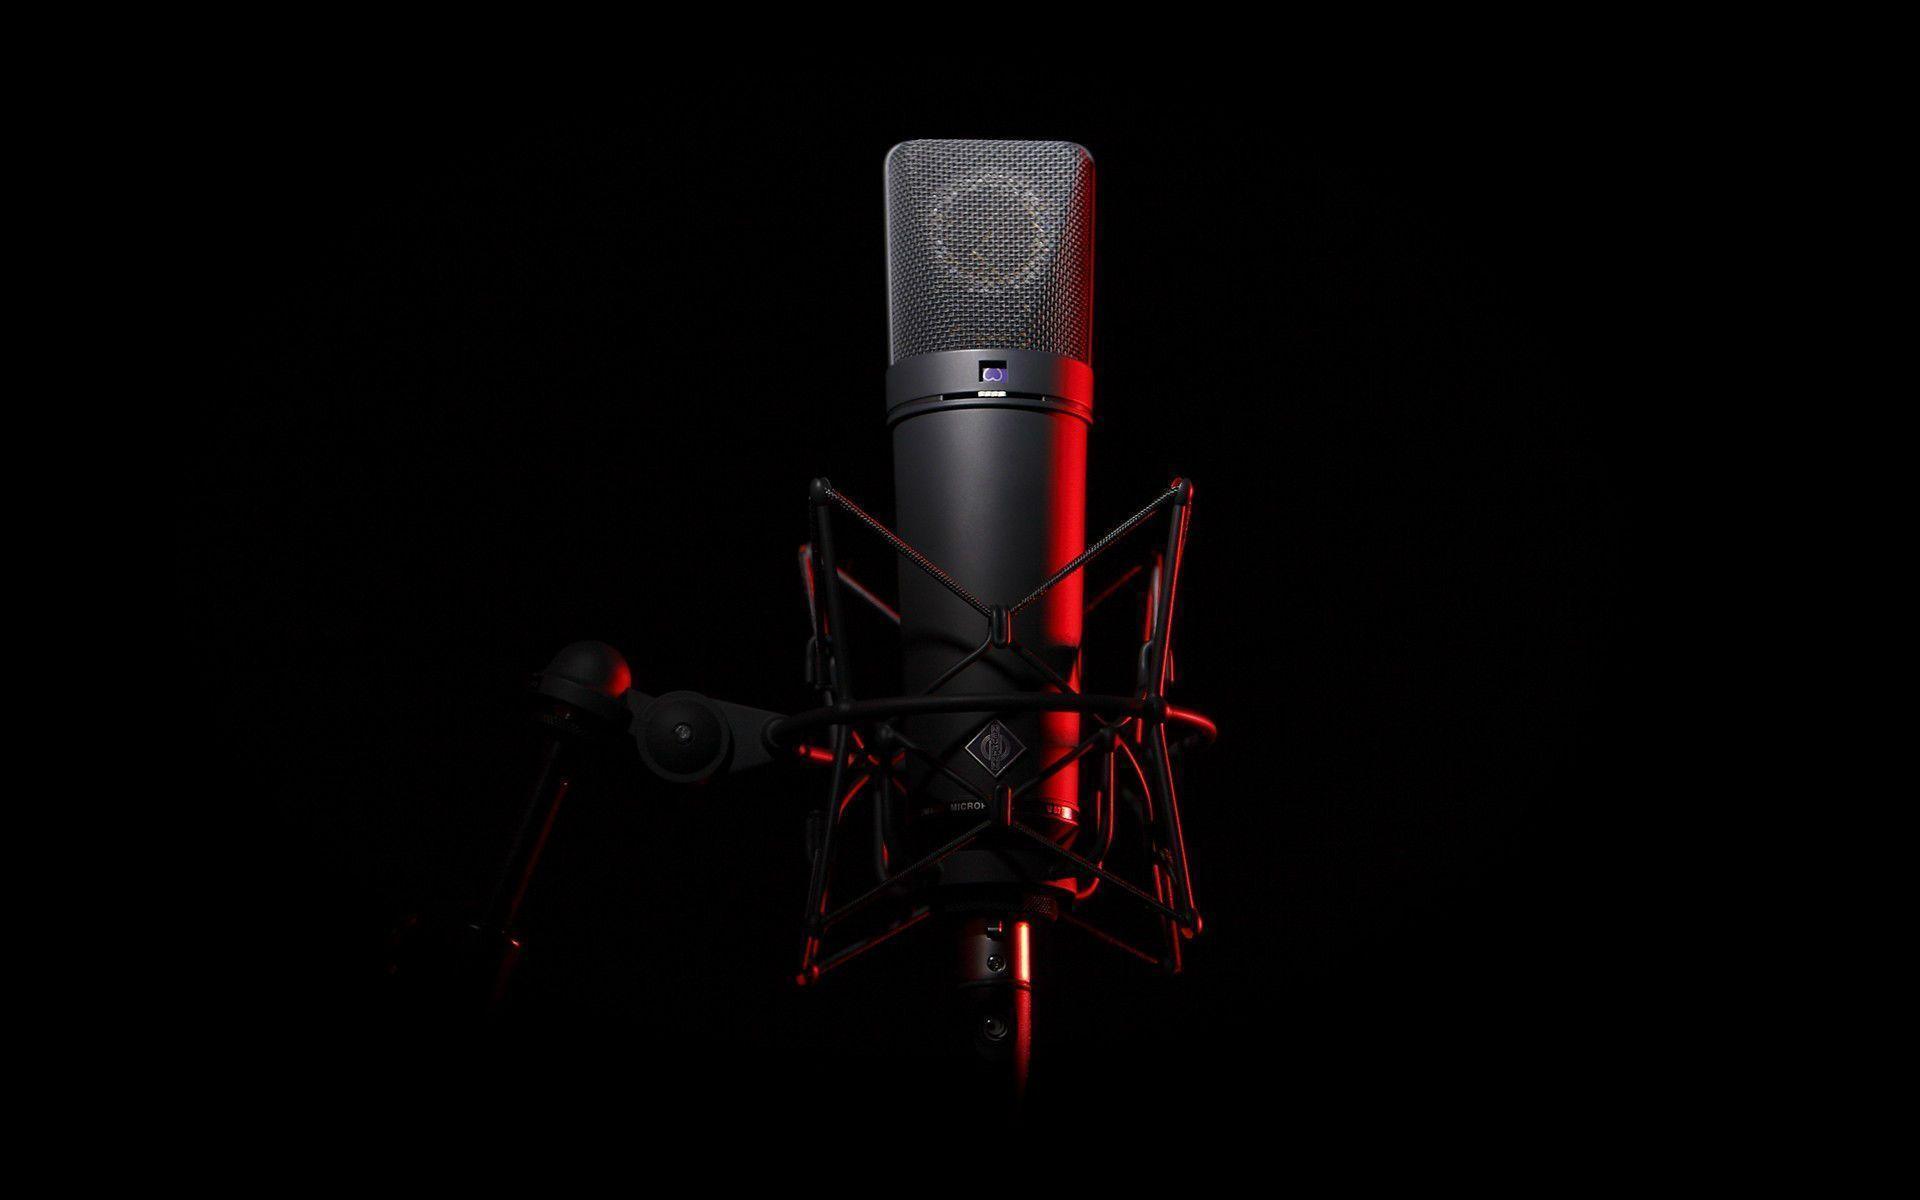 Recording Studio Wallpapers 1920x1200